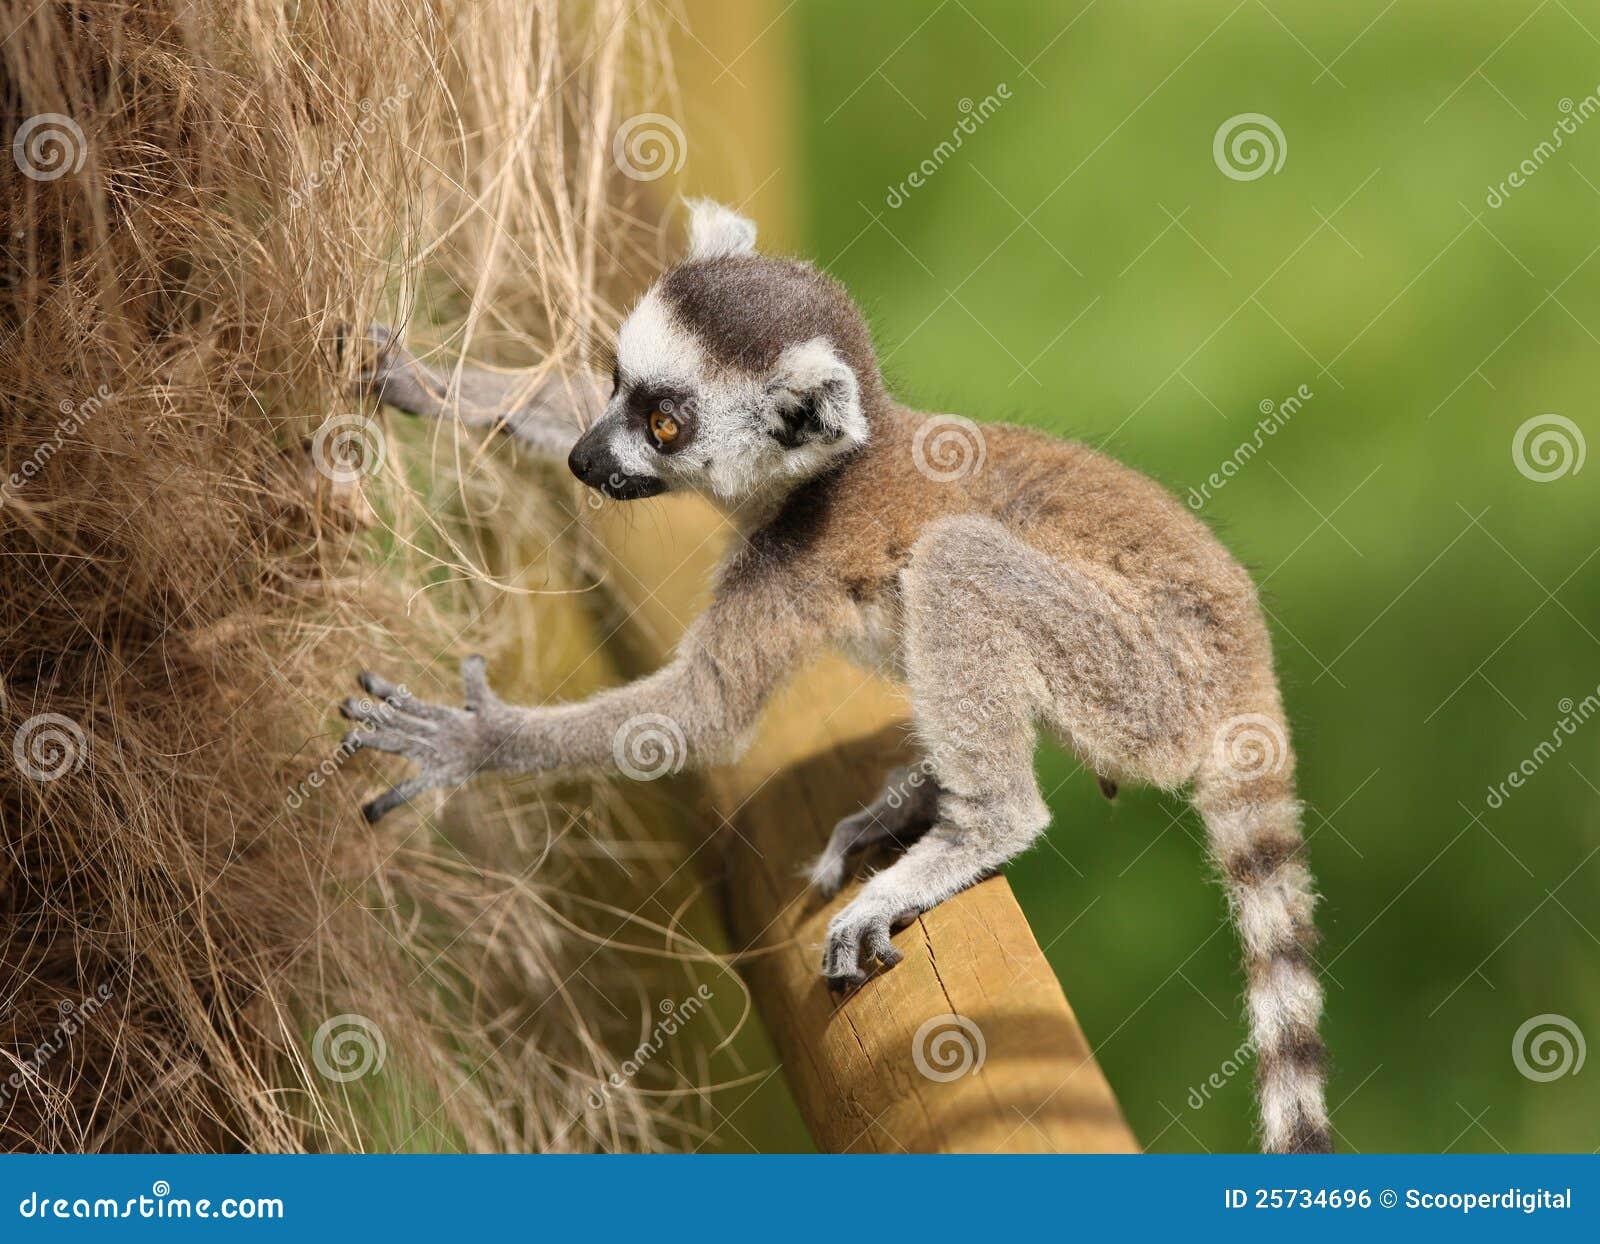 Ring tailed lemur baby sale - photo#19